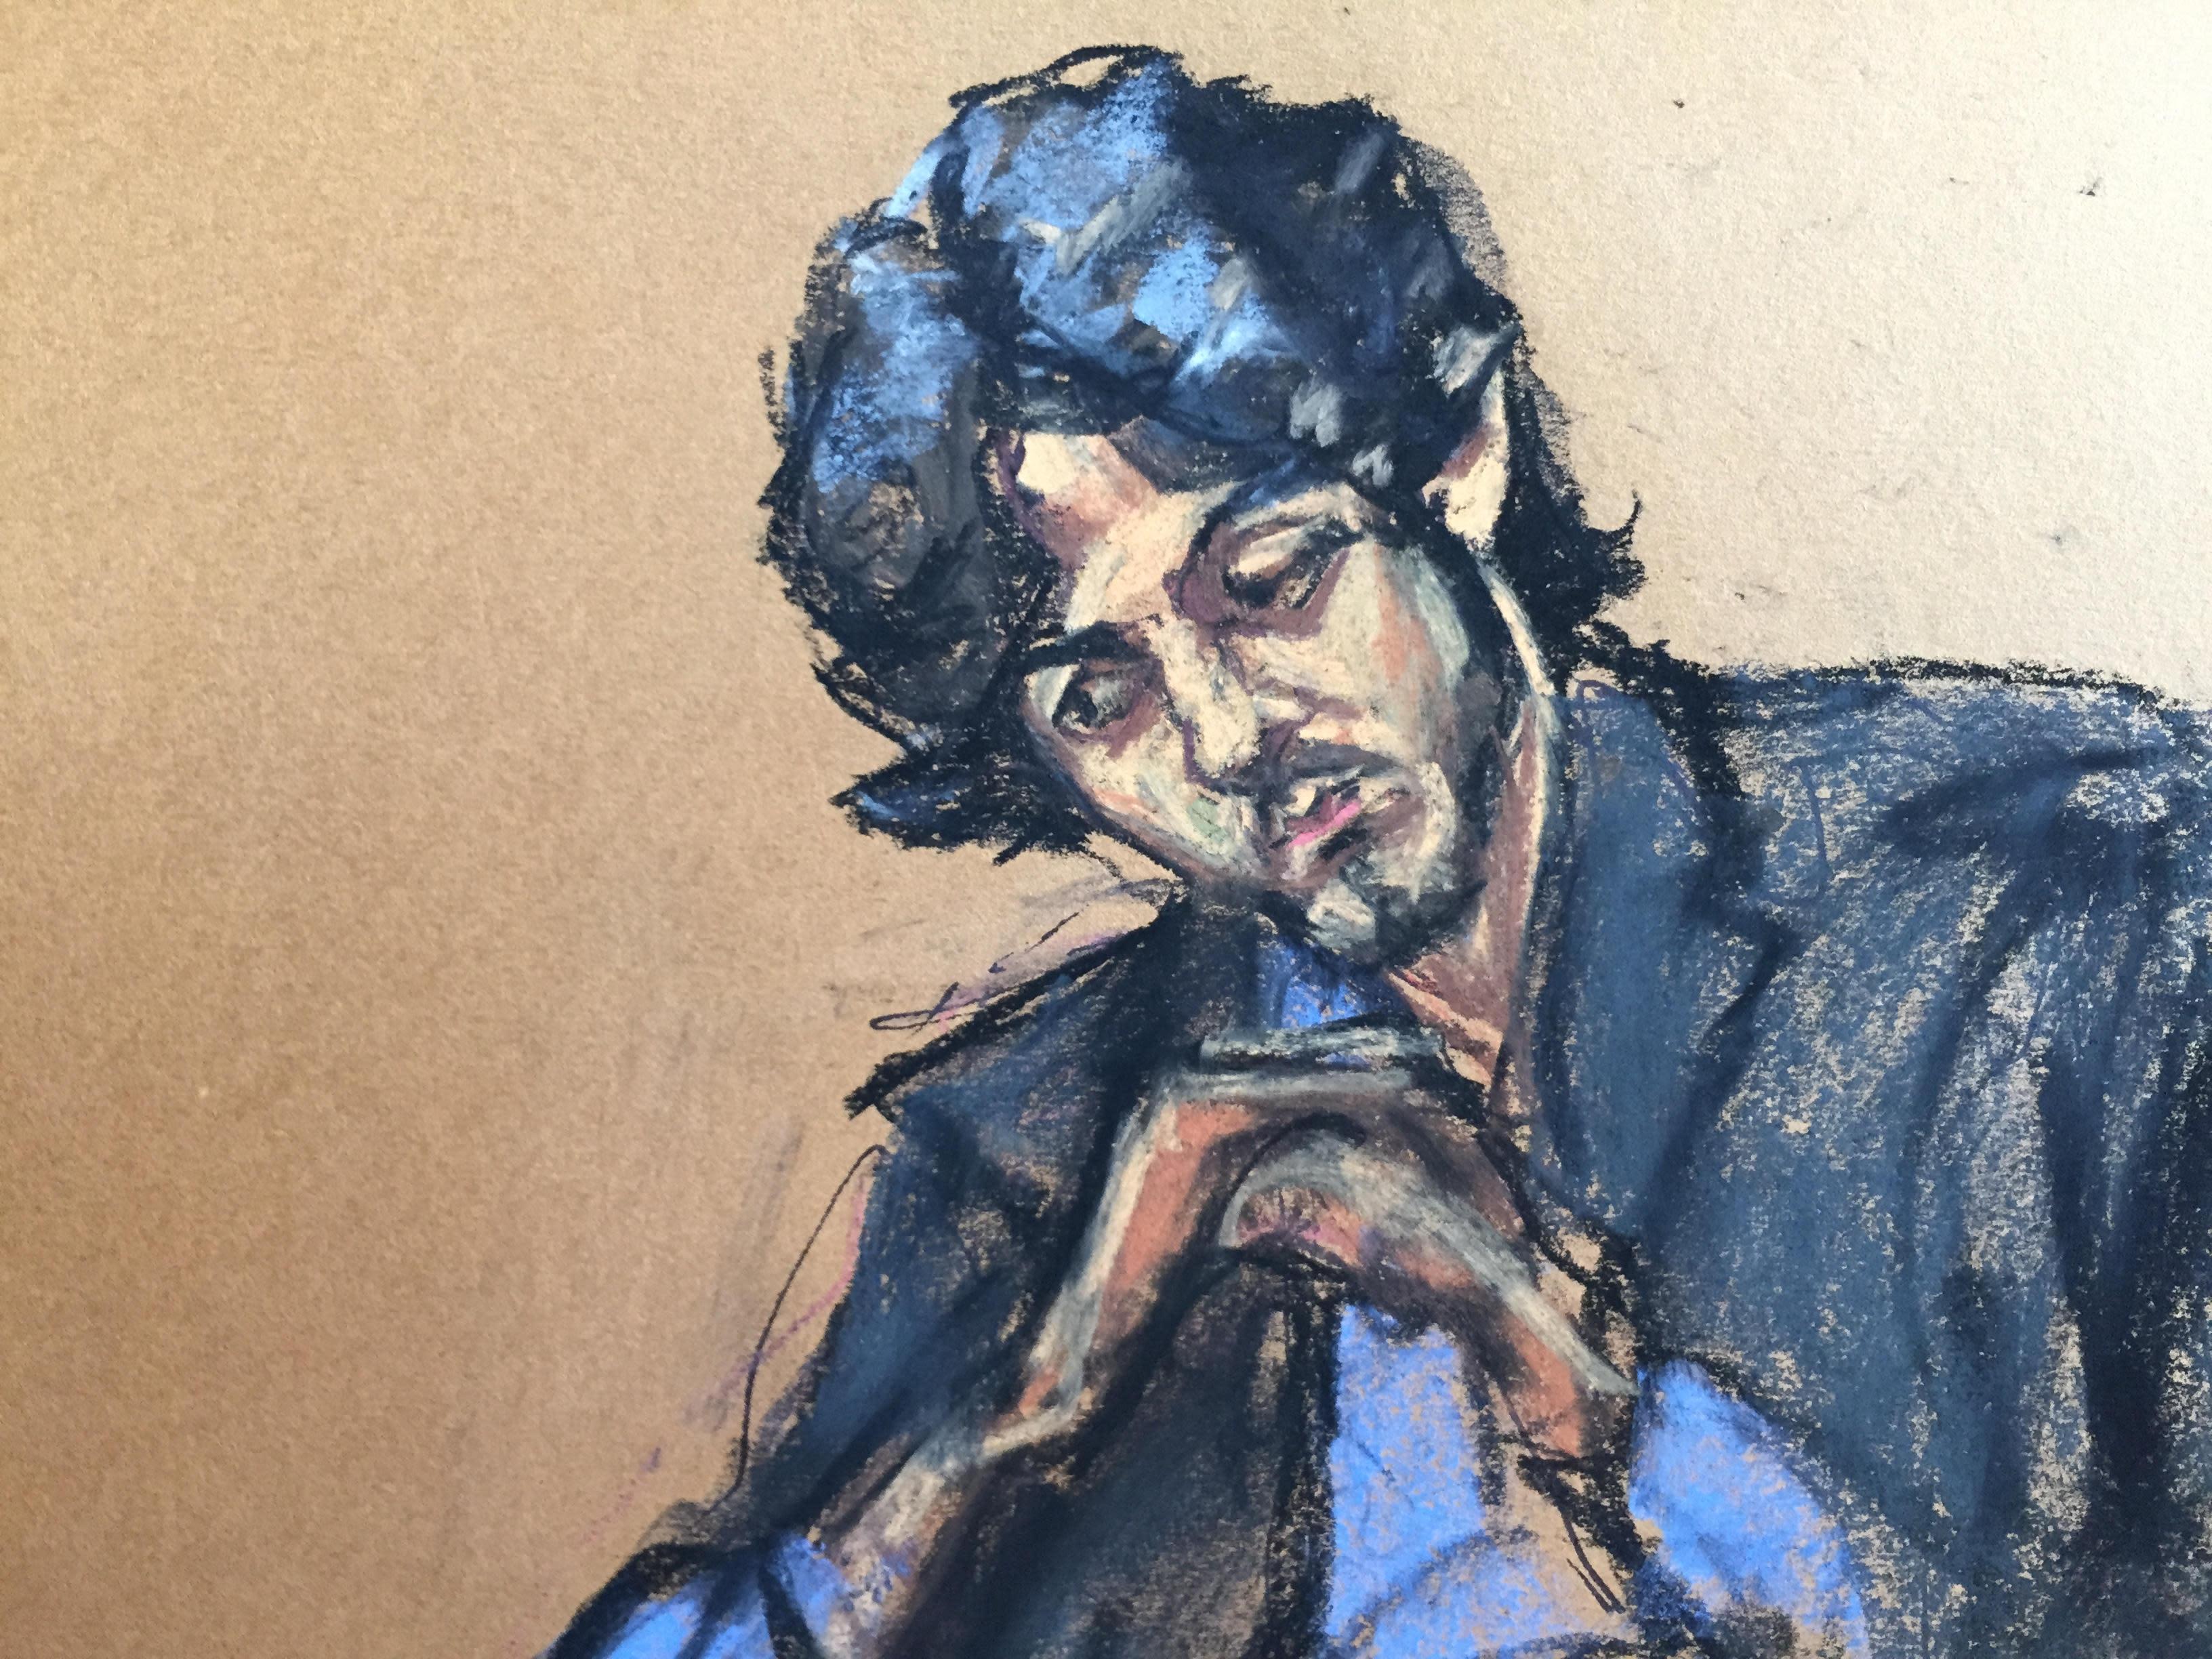 Appeals court overturns death penalty for Boston Marathon bomber